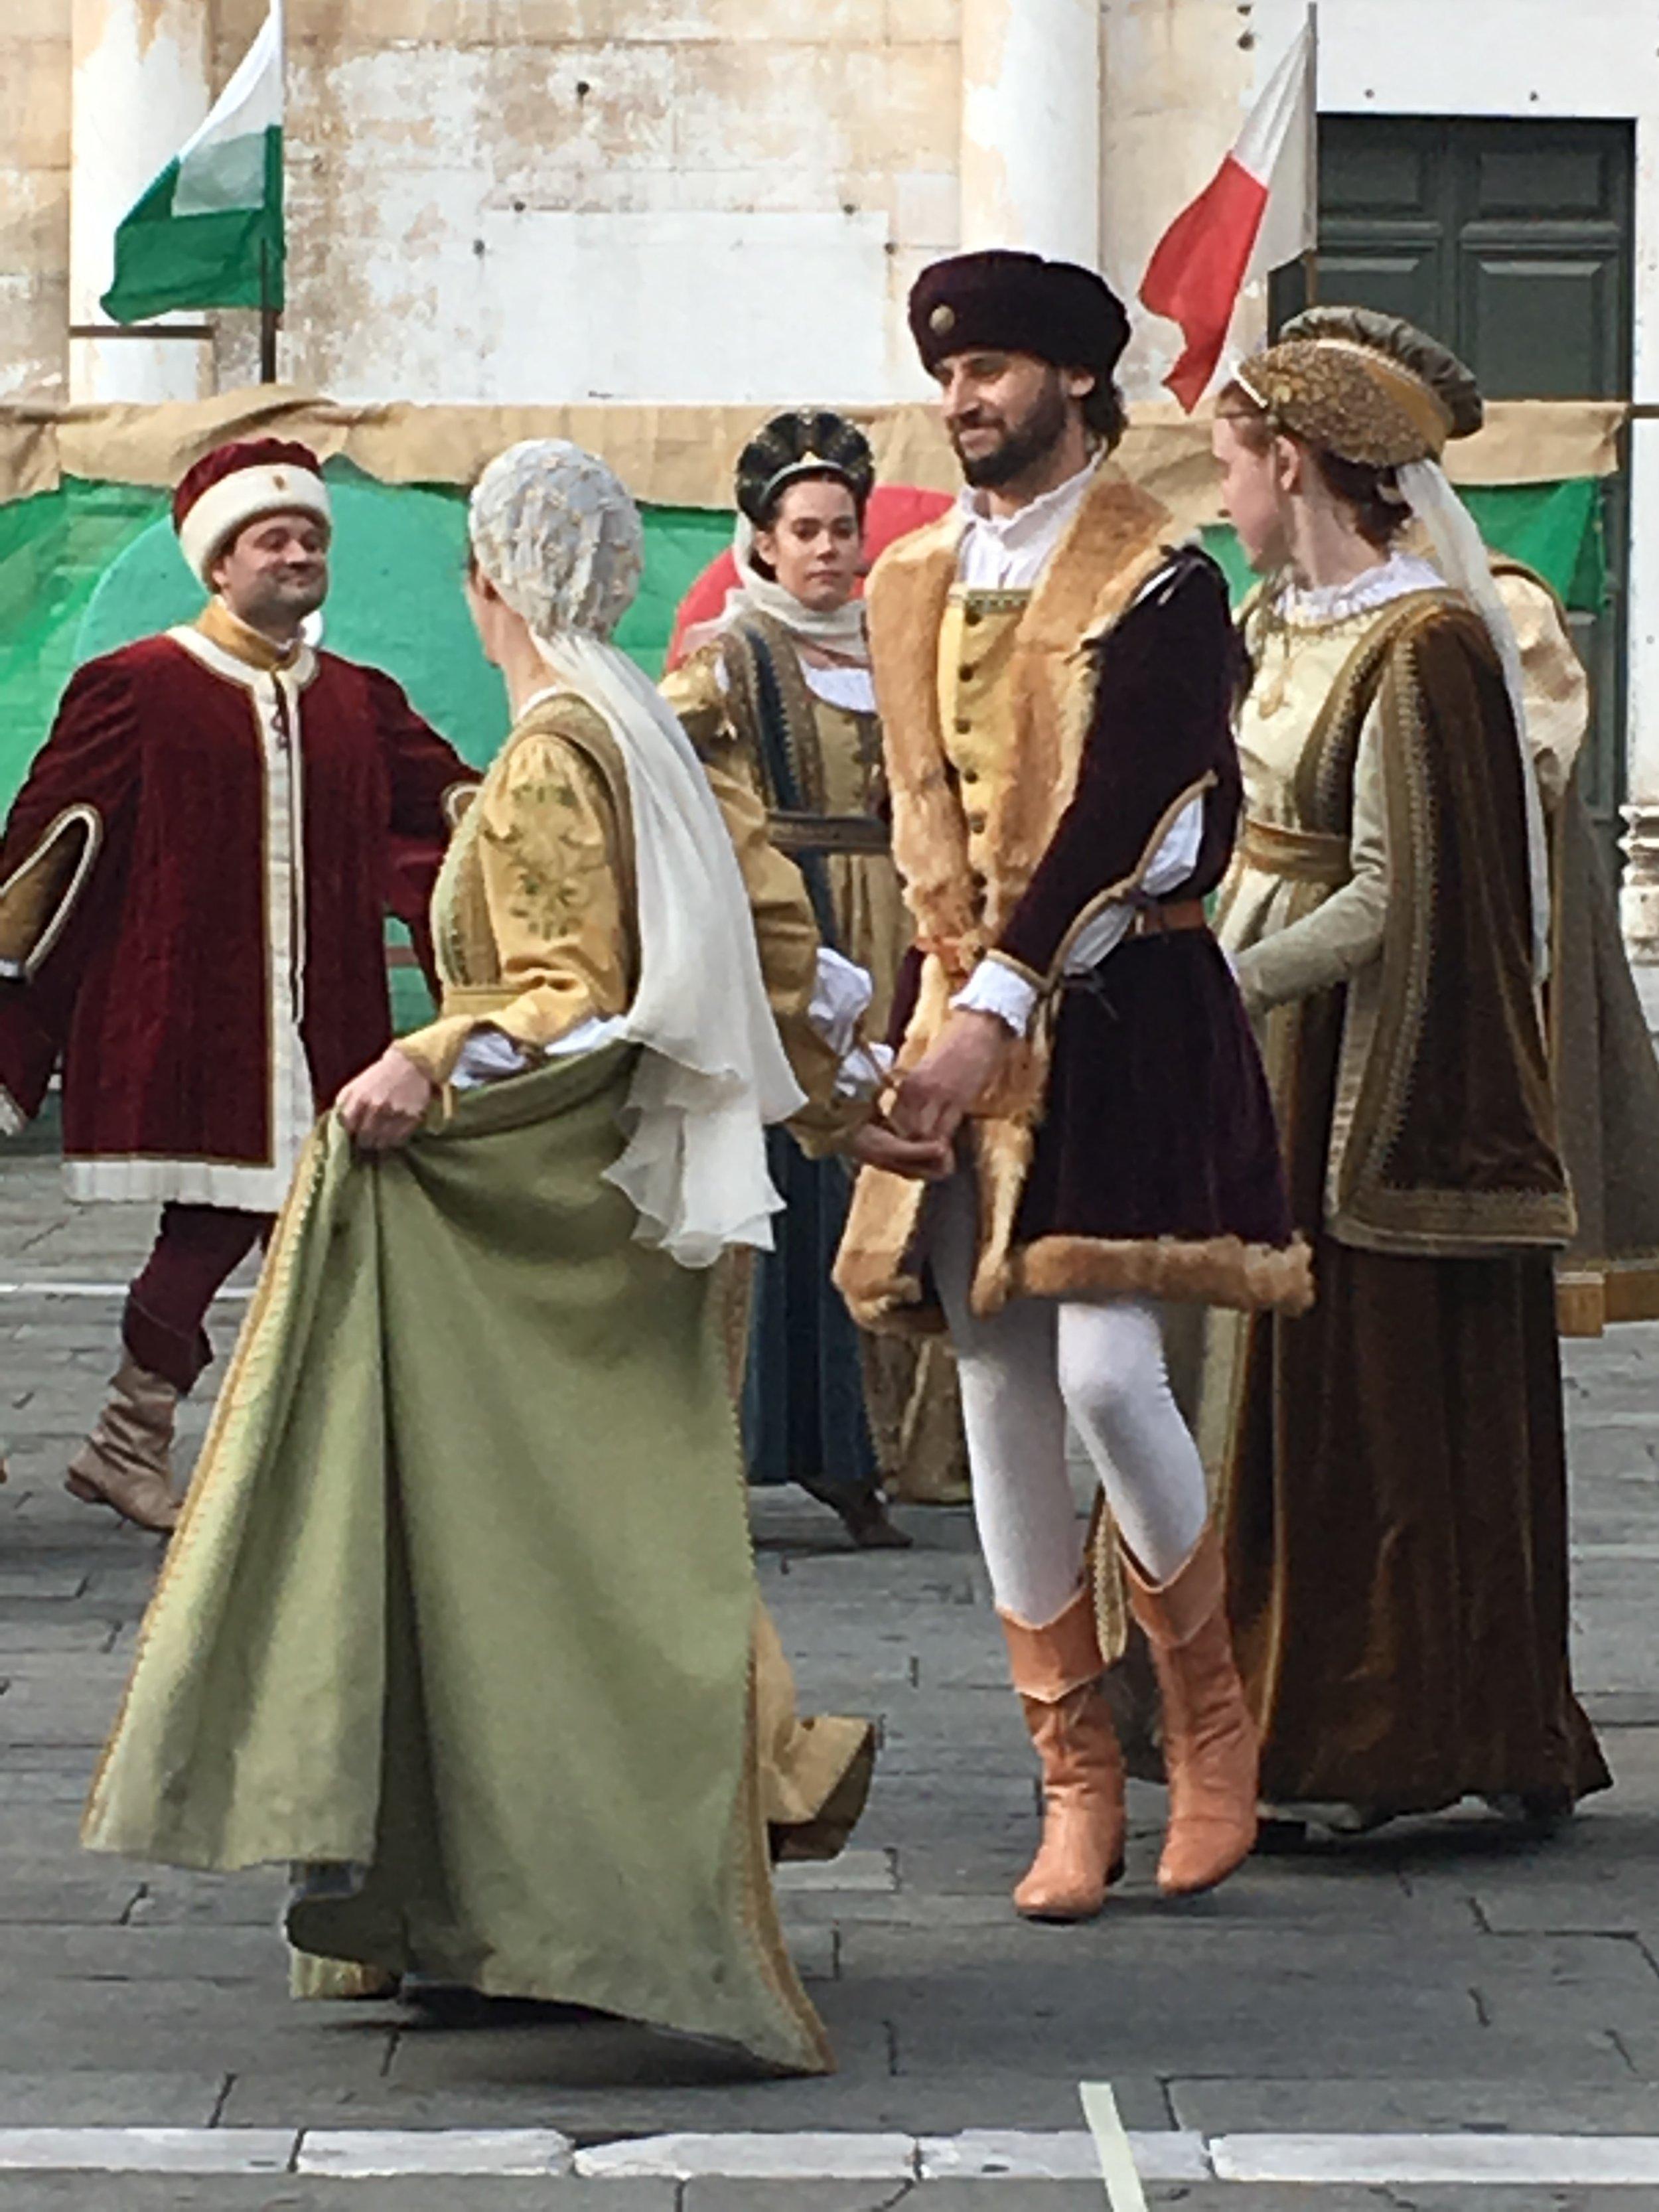 Dancers in medieval costume.